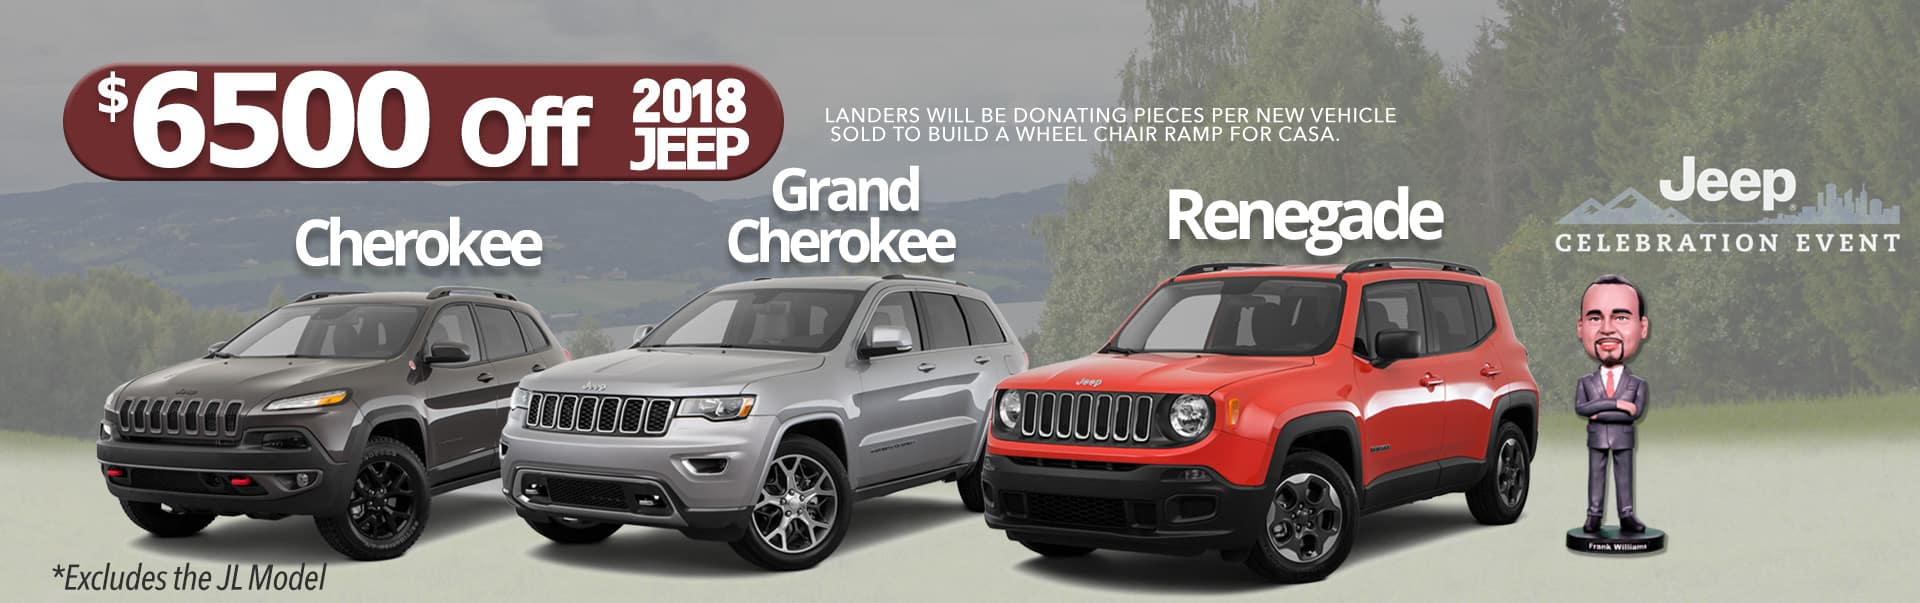 Pick from 5 Models for $6500 OFF at Landers McLarty Dodge Chrysler Jeep Ram in Huntsville, AL!